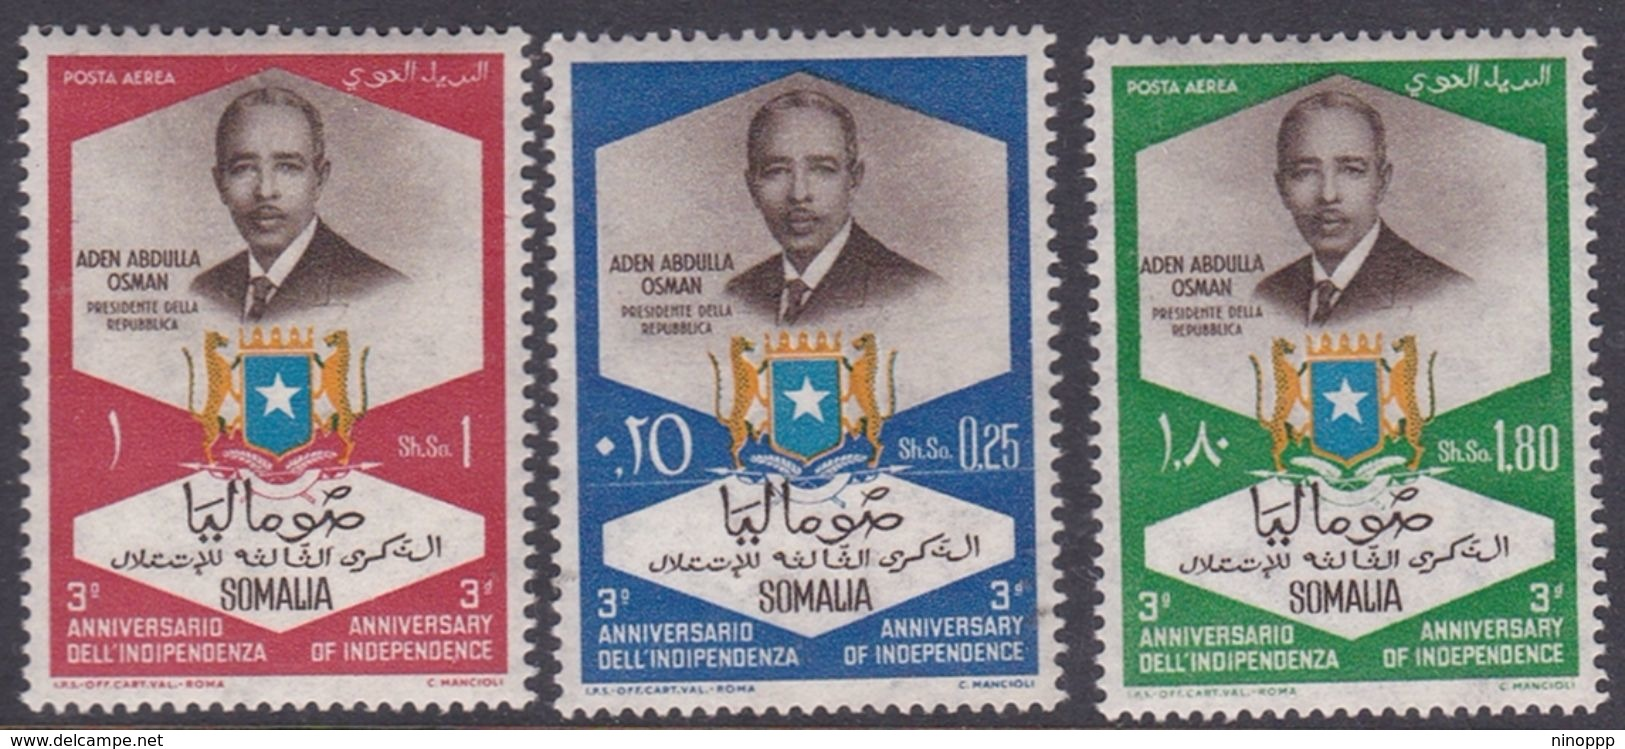 Somalia Scott 270 + C90-91 1963 3rd Anniversary Of Independence, Mint Never Hinged - Somalia (AFIS)